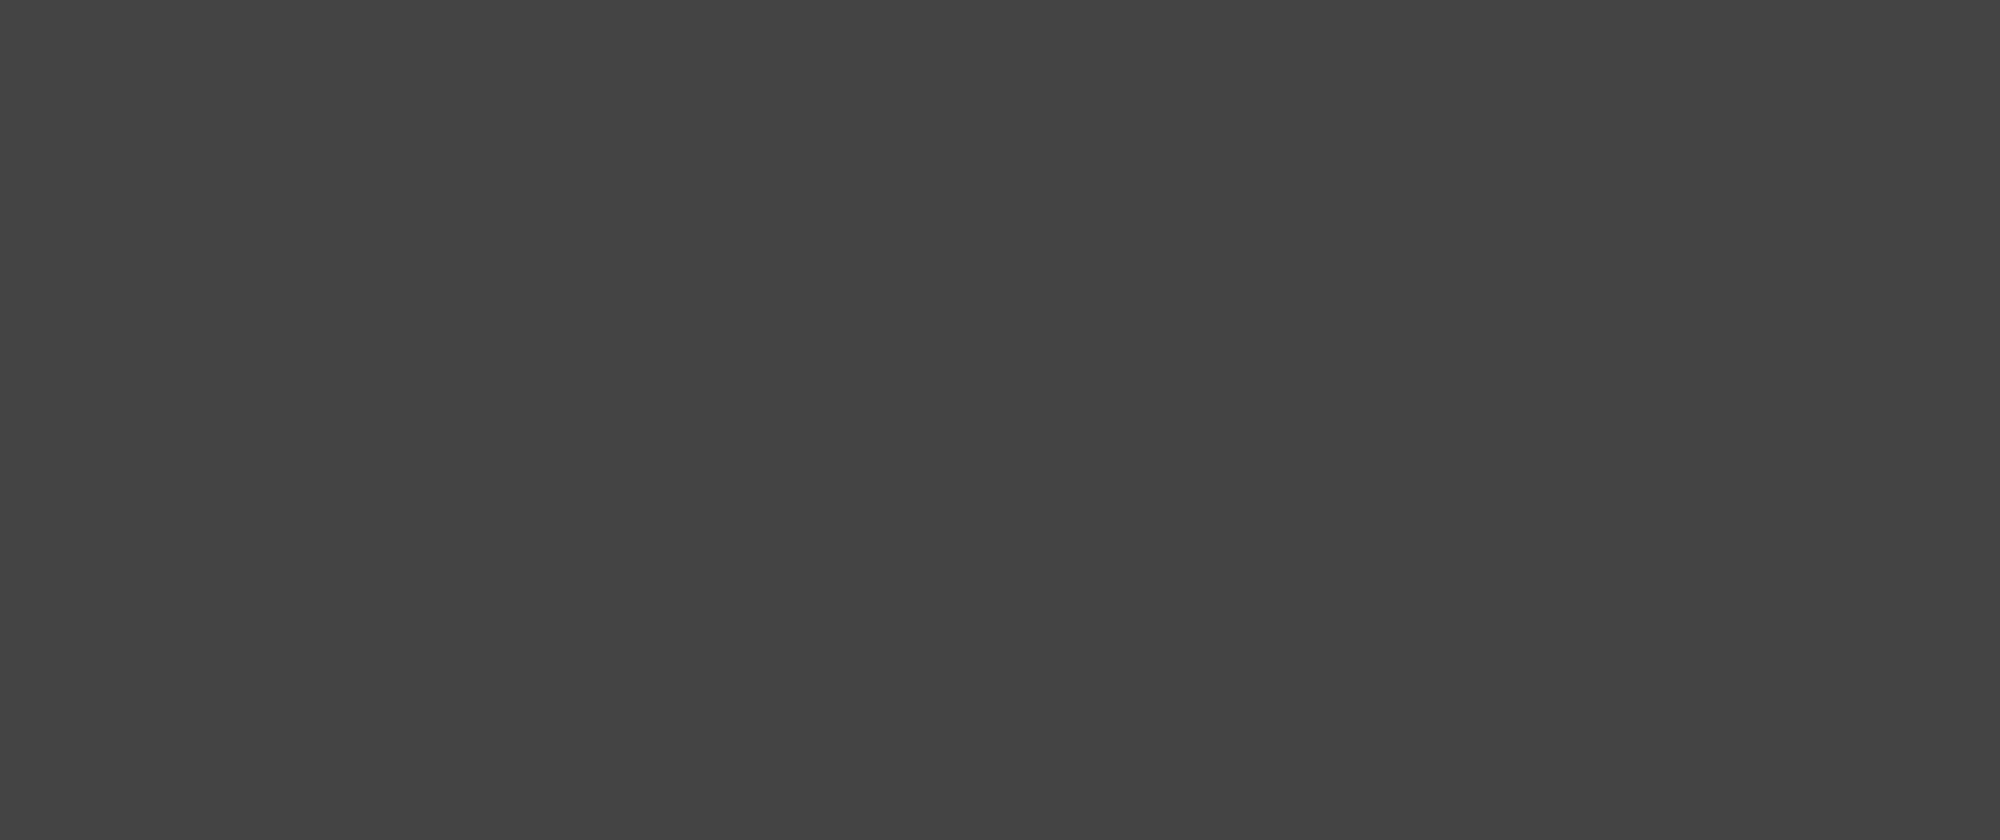 Taito Cafe logo